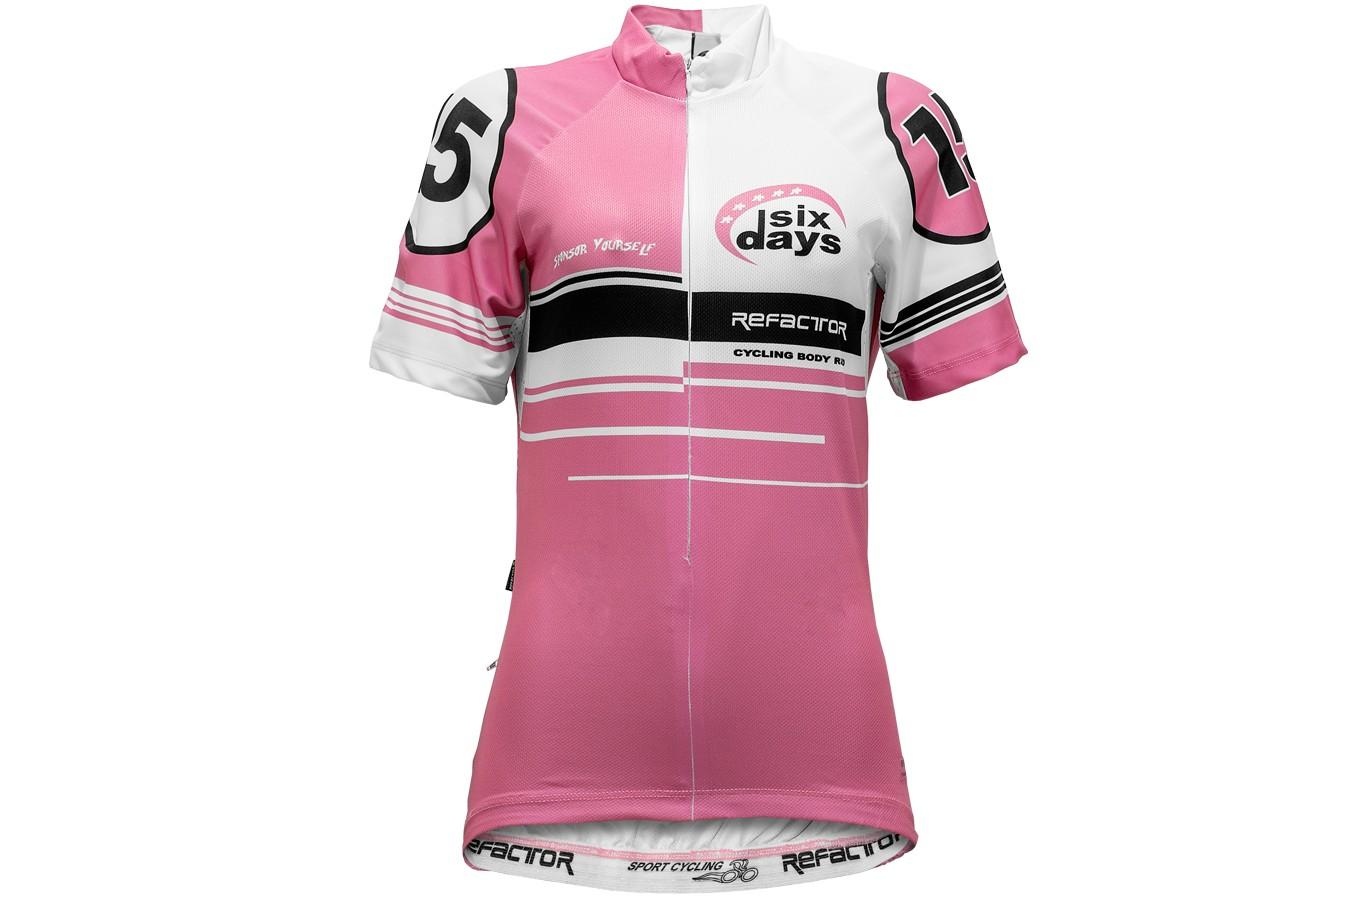 Camisa Ciclista Feminina Number - Refactor Cor Rosa Tamanho Camisa M 22d5206c5e474